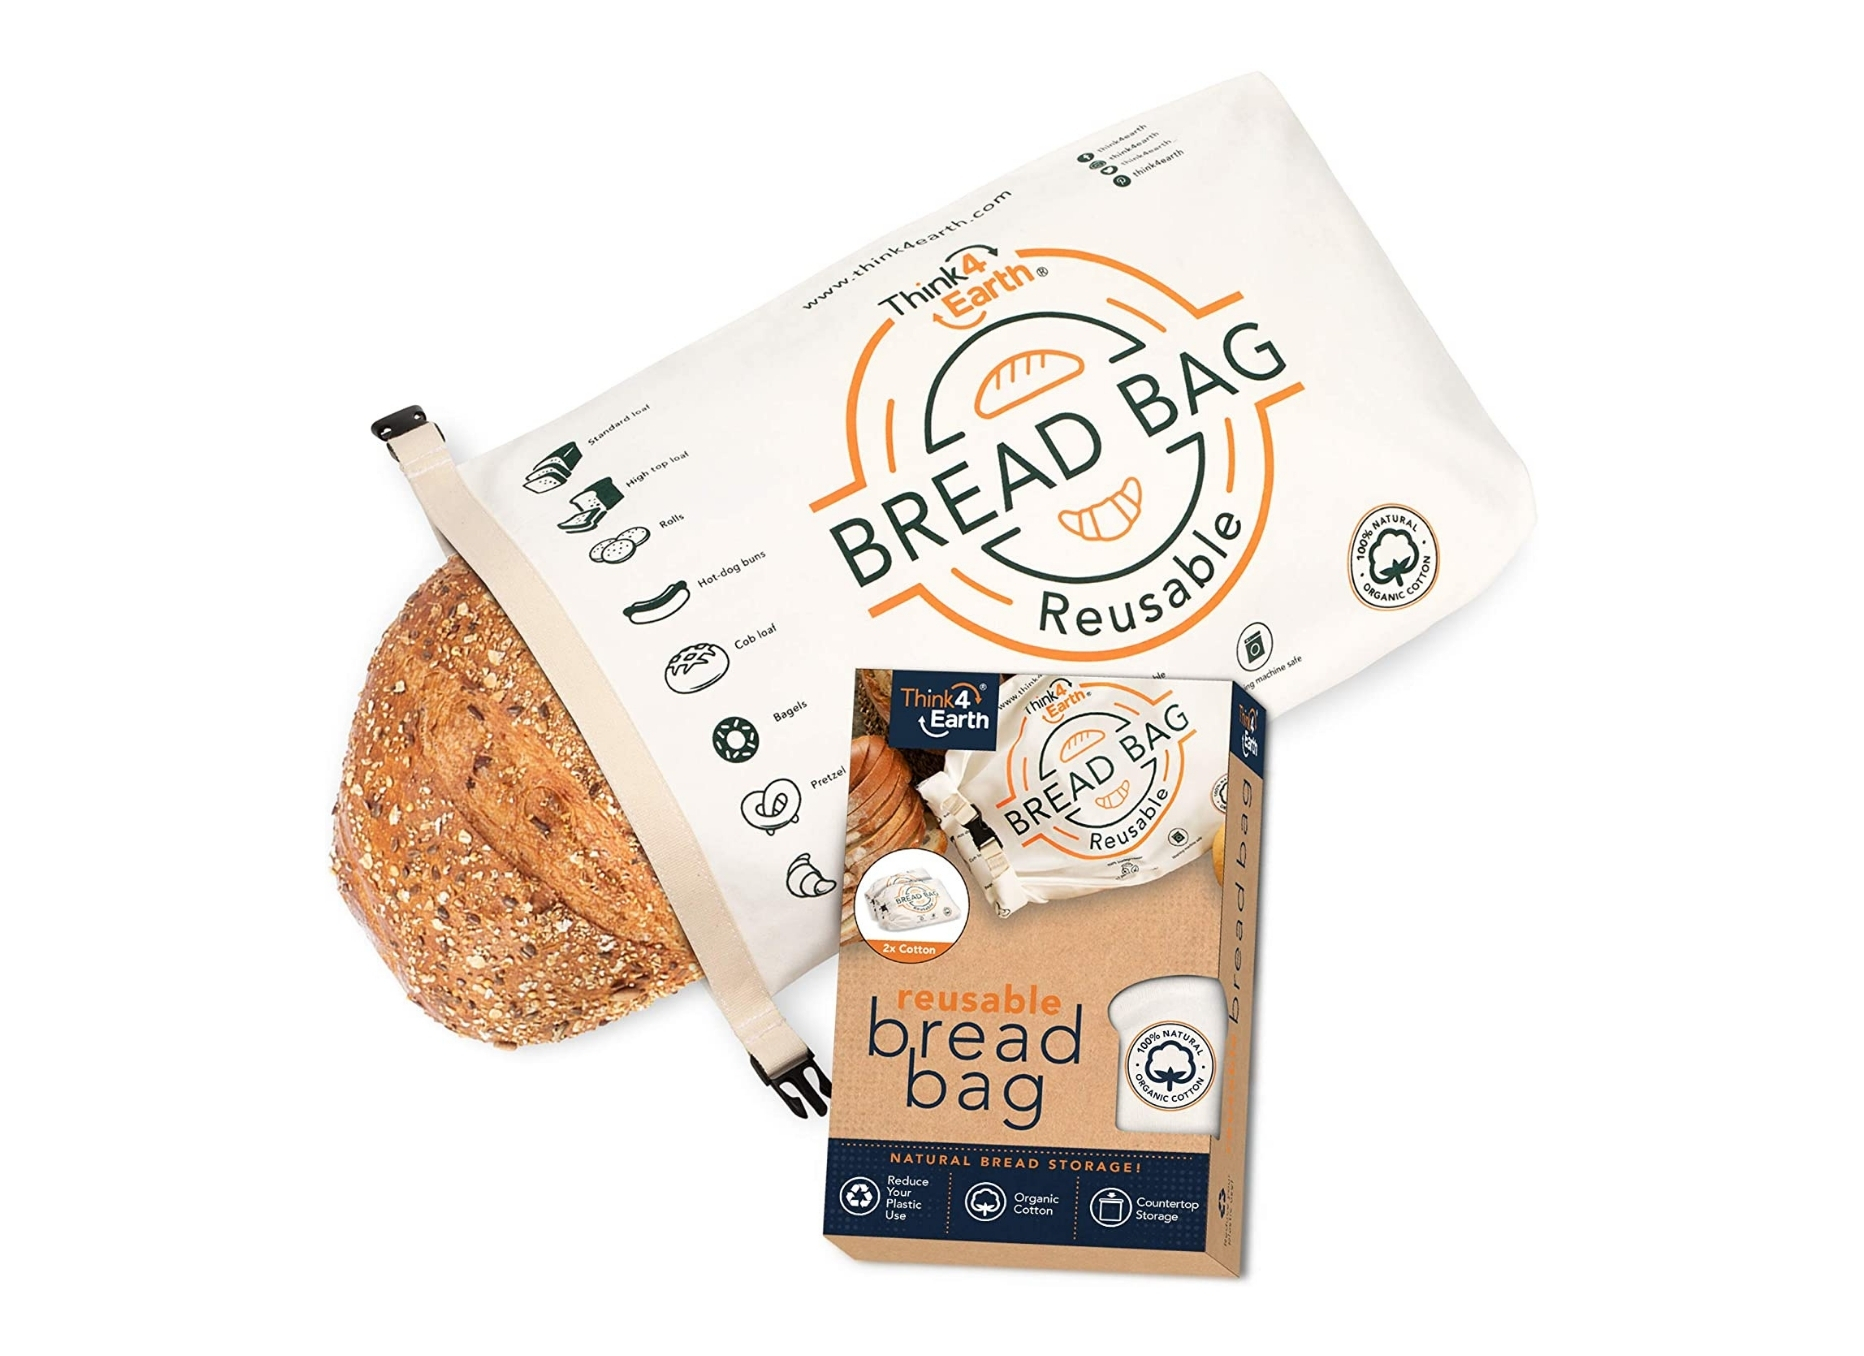 Bread bag cotton